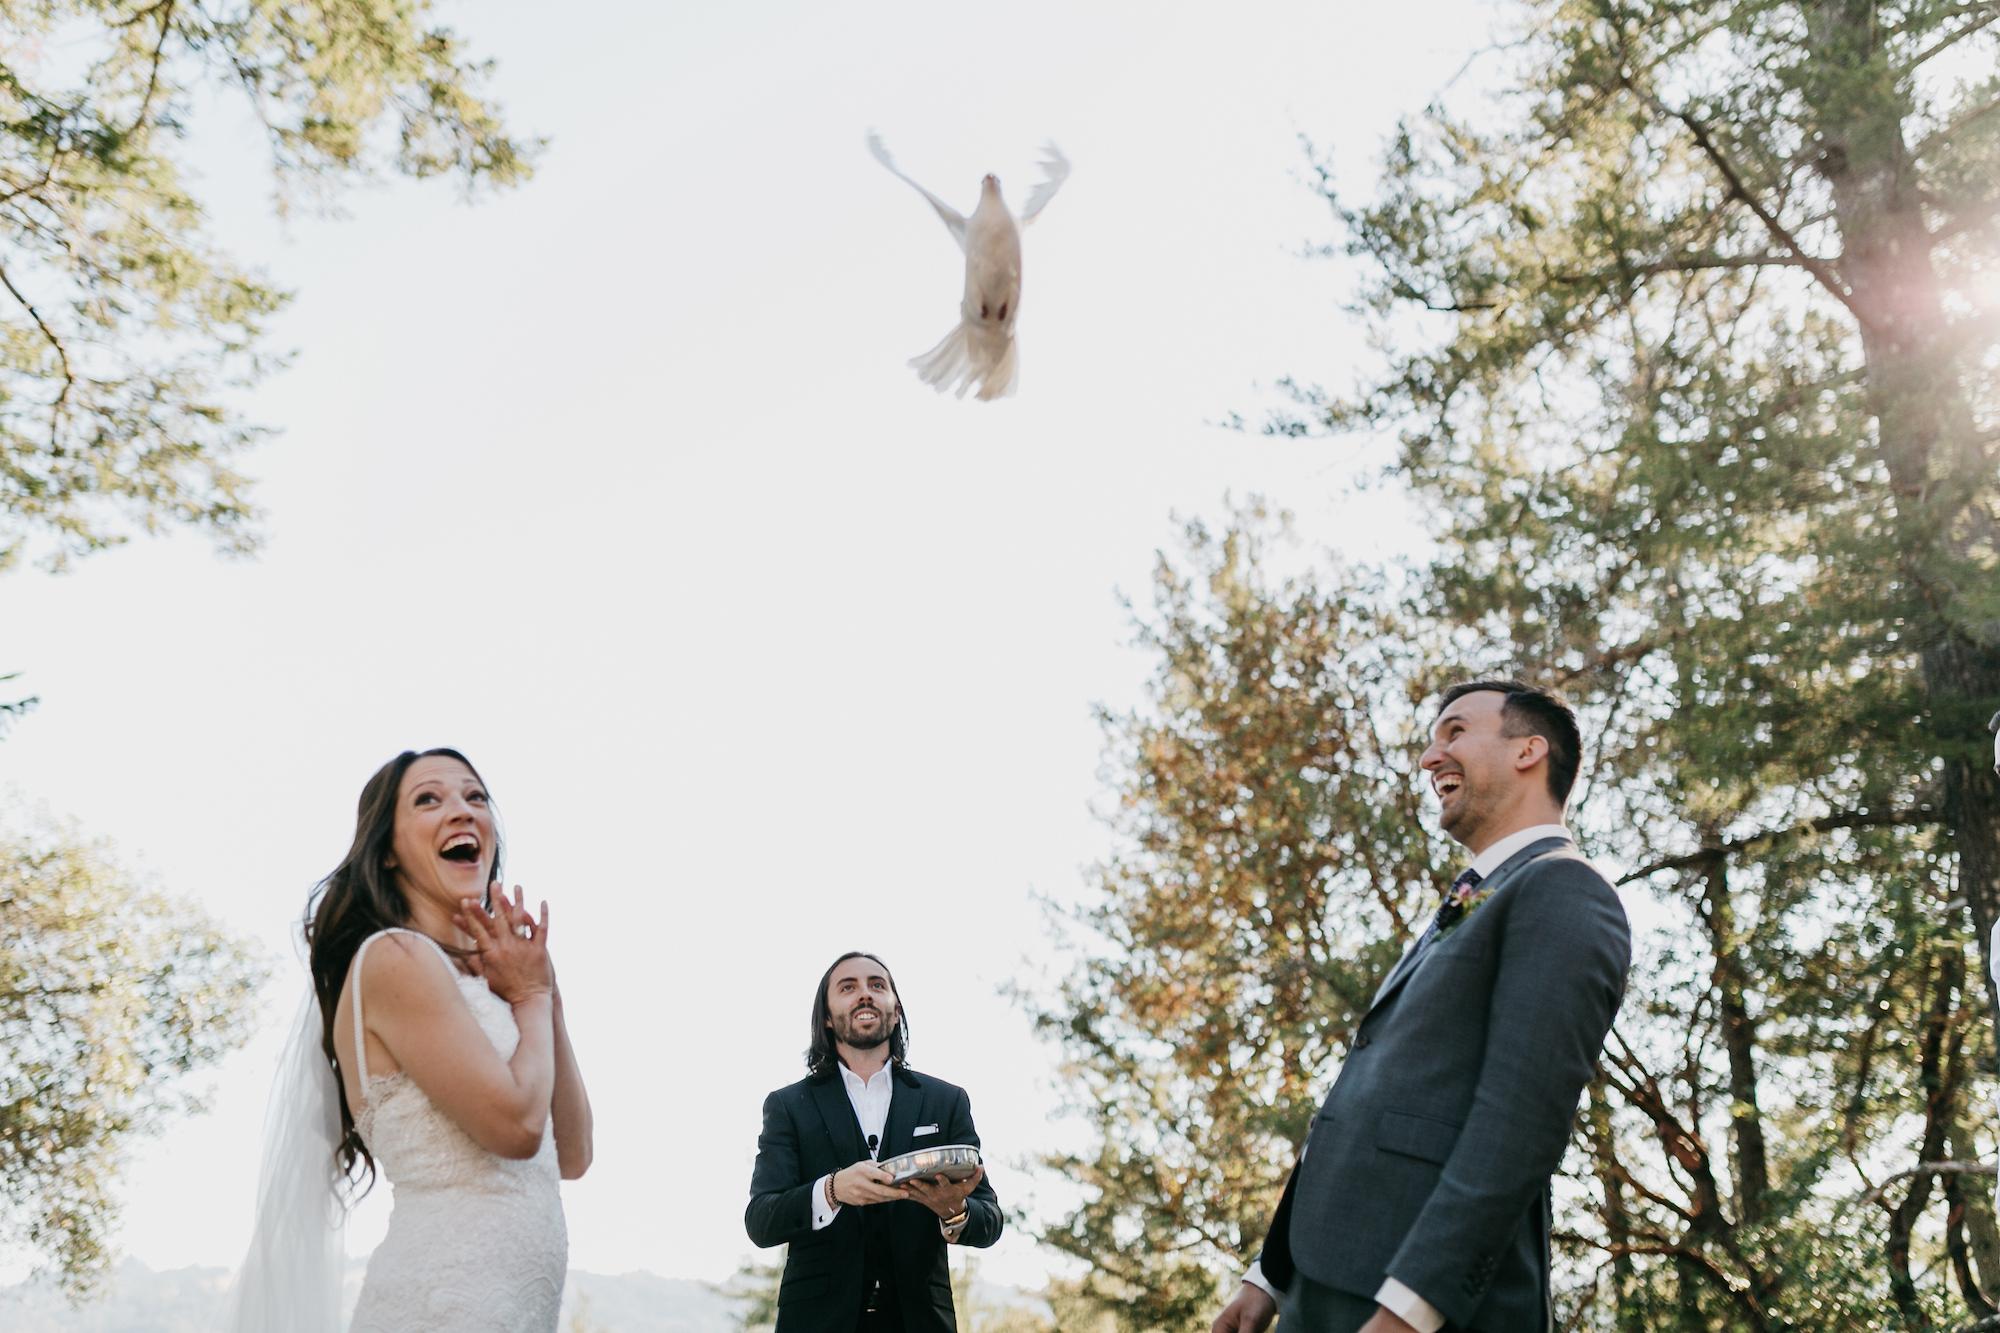 anvil-vineyards-wedding-photographer446.jpg